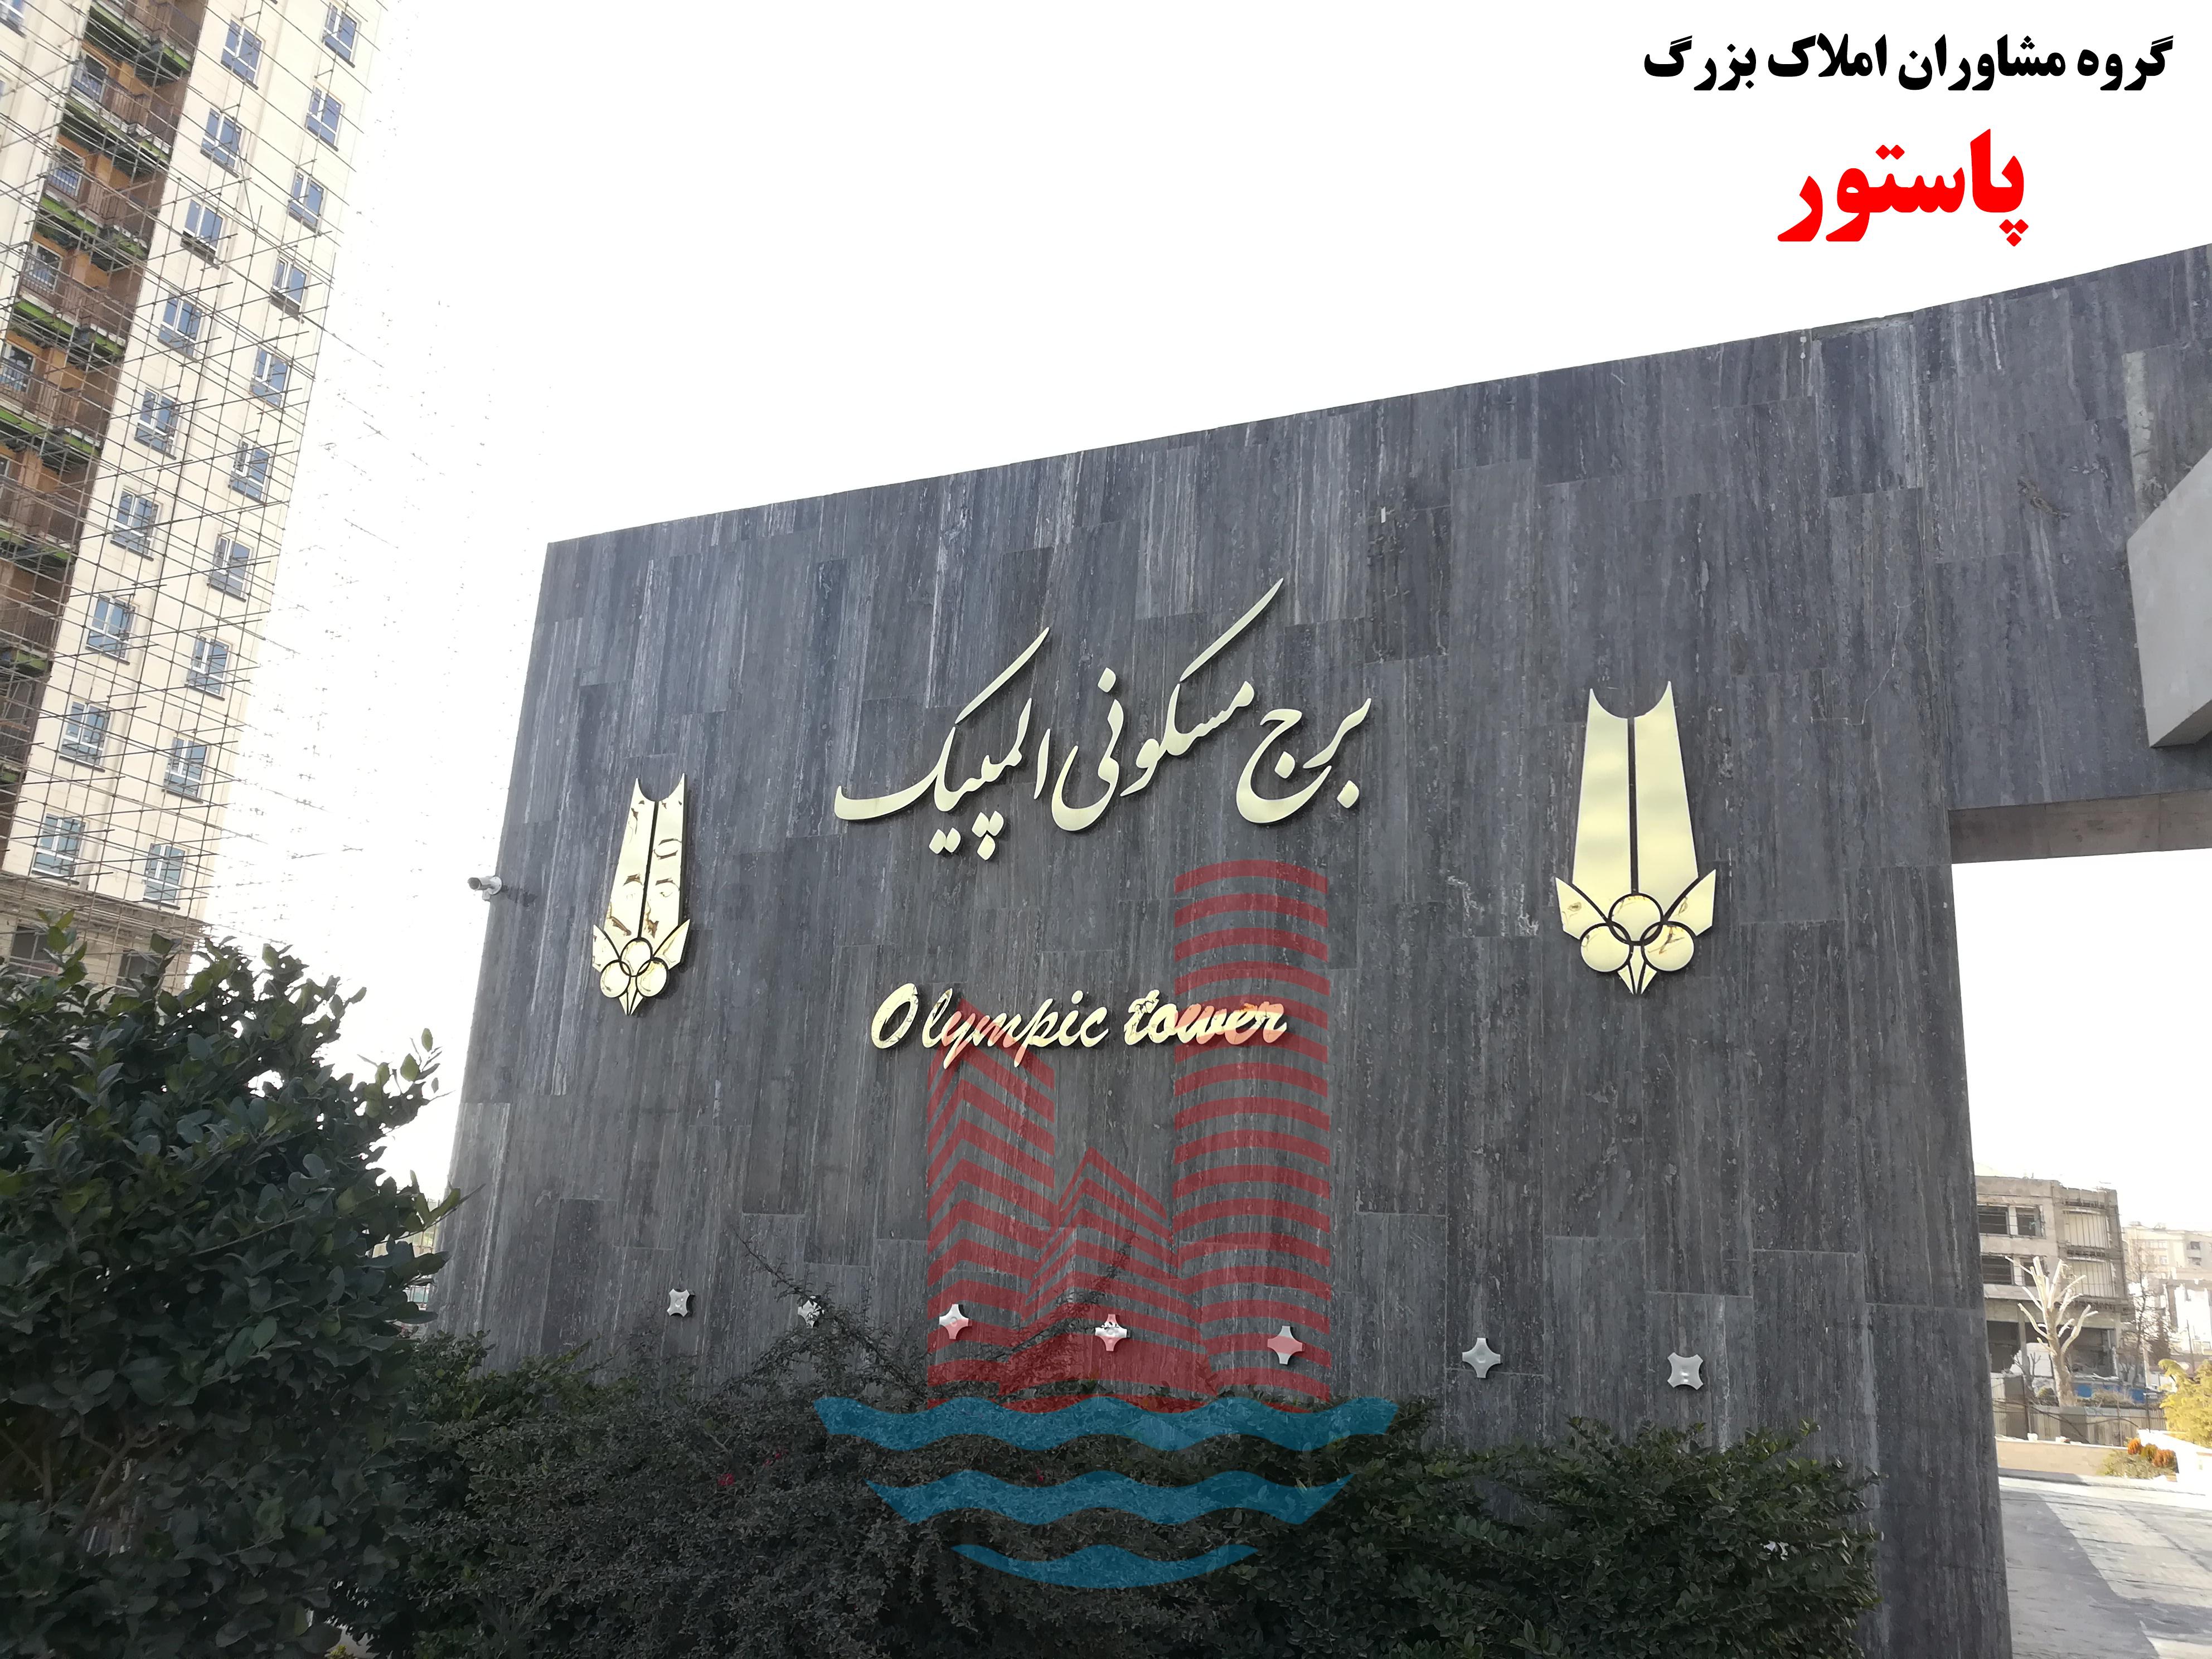 ورودی برج های دقلوی المپیک